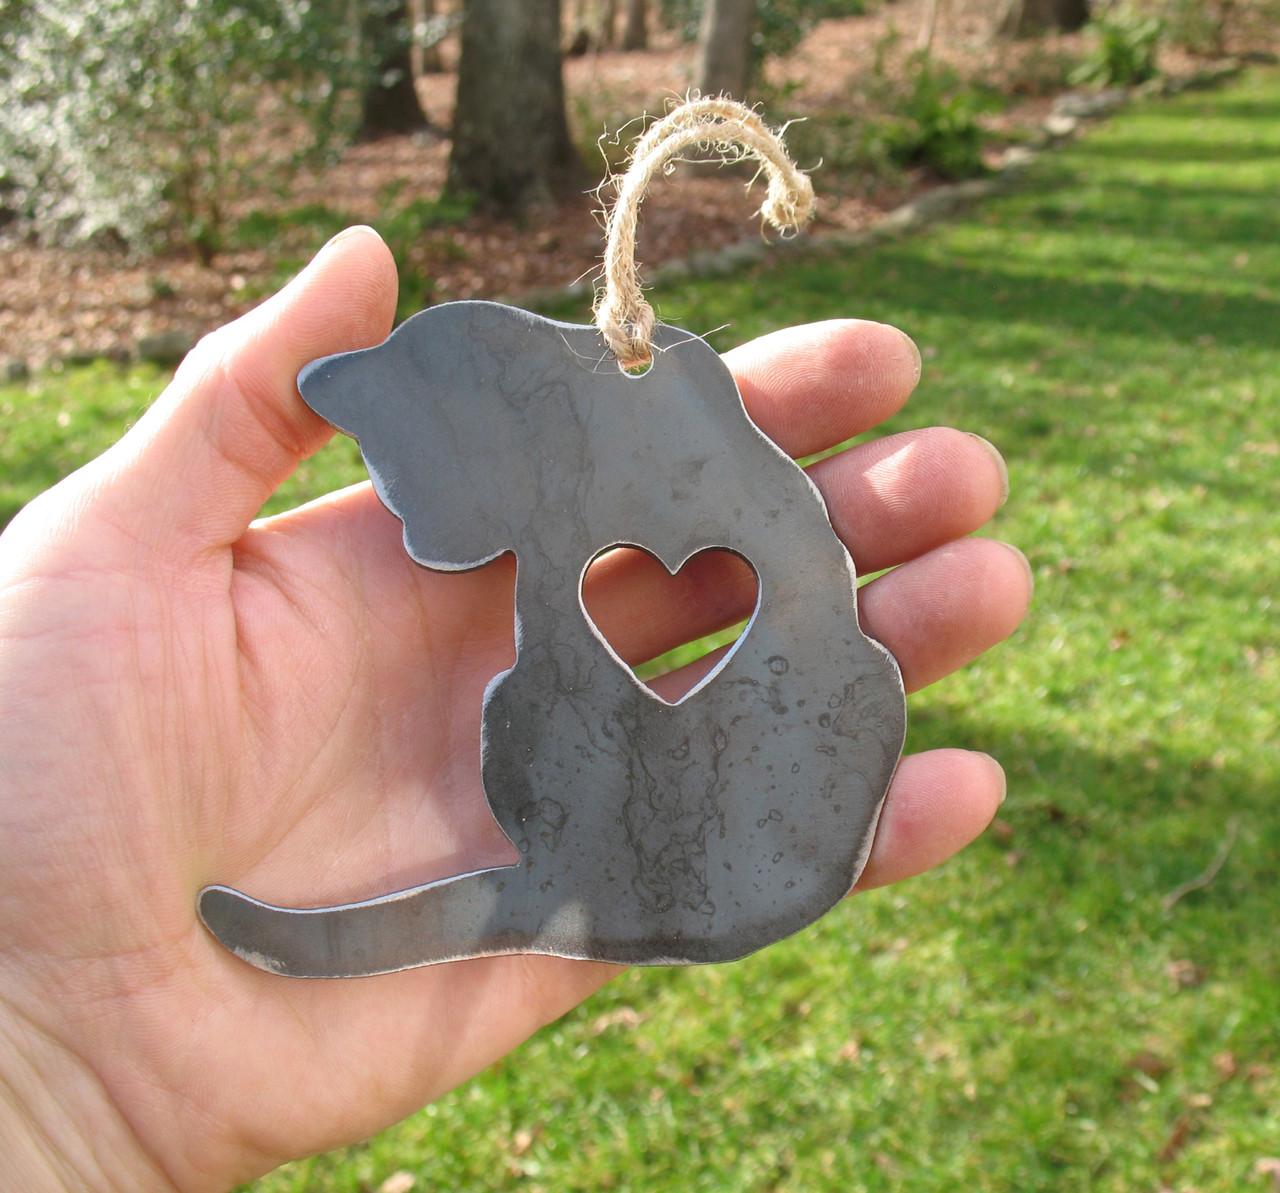 Cat 2 Ornament Rustic Raw Steel Easter Basket Gift for Her Him - Metal Pet Memorial Gift - Cat Lover Gift